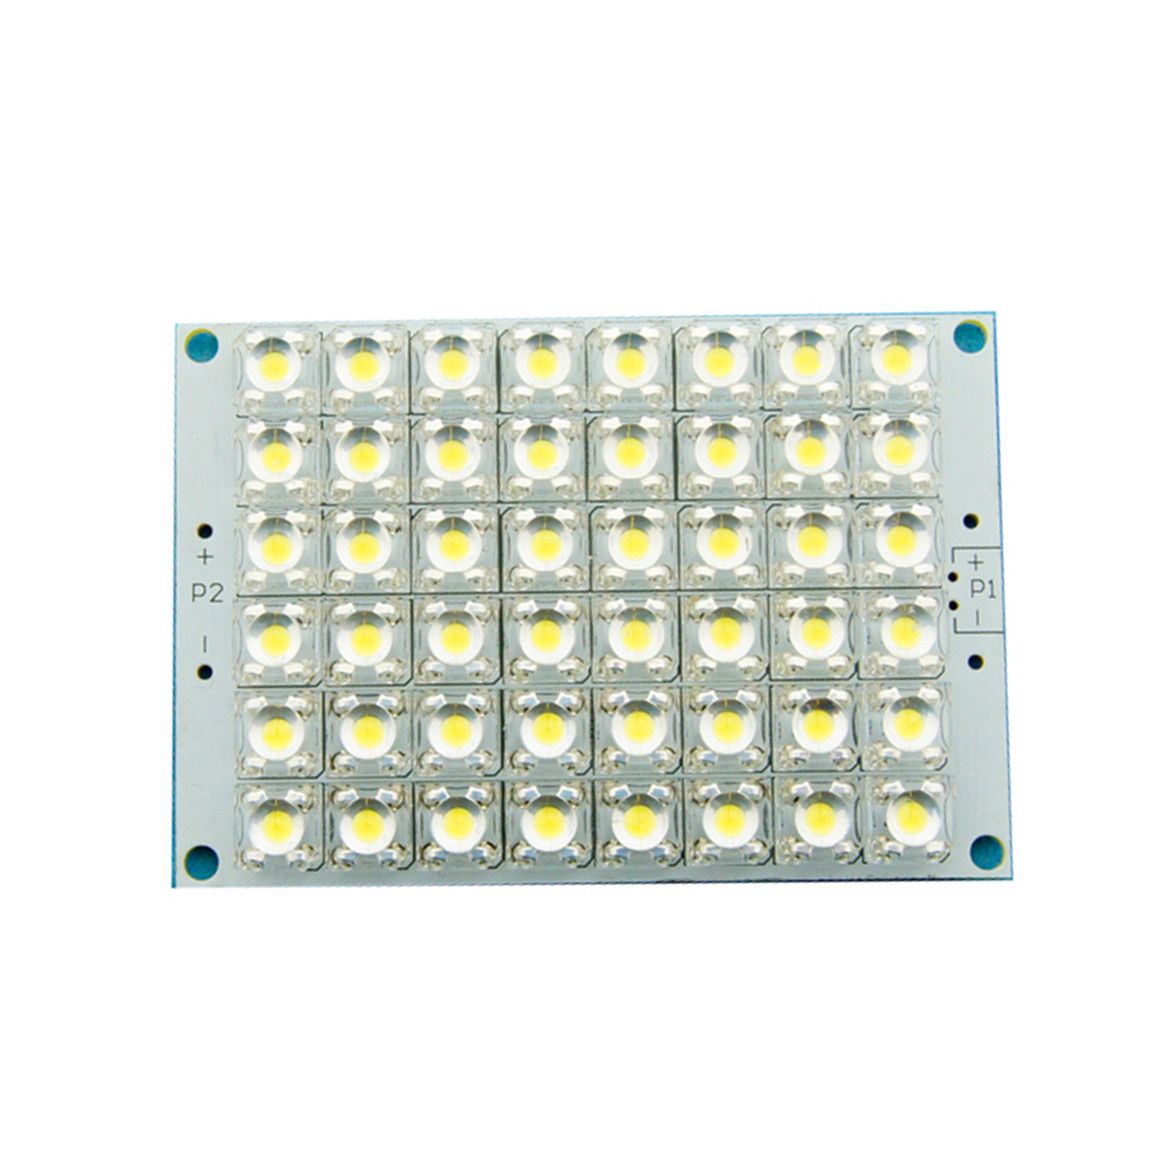 super bright 12v white light 48 led piranha led panel board lamp lighting f car ebay. Black Bedroom Furniture Sets. Home Design Ideas